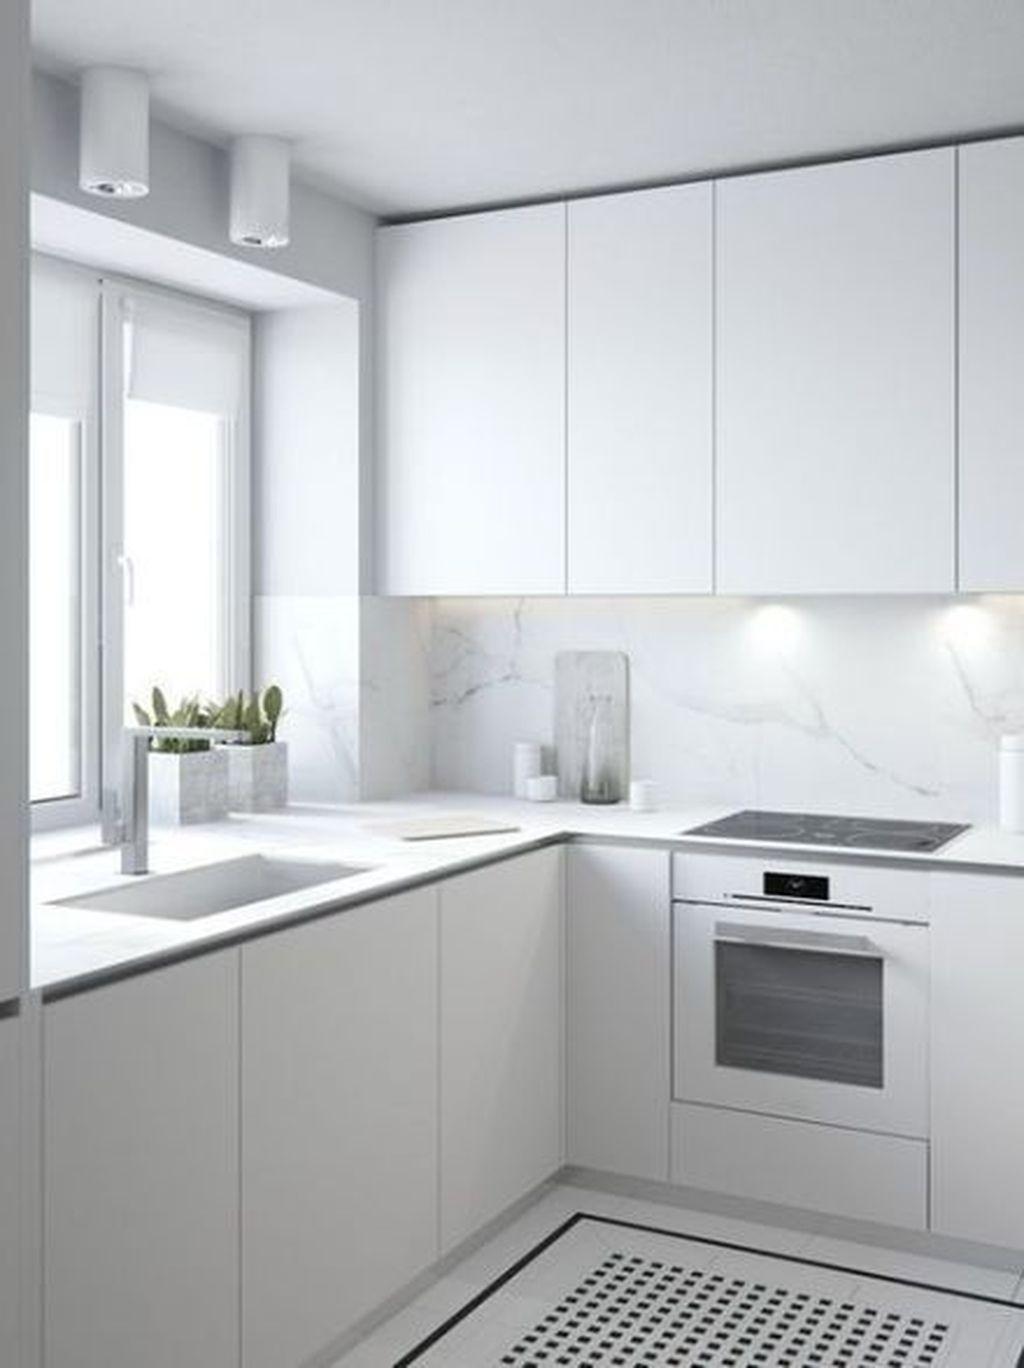 45 Minimalist Kitchen Decor Ideas Modern Kitchen Cabinets Kitchen Cabinet Design Modern Kitchen Design